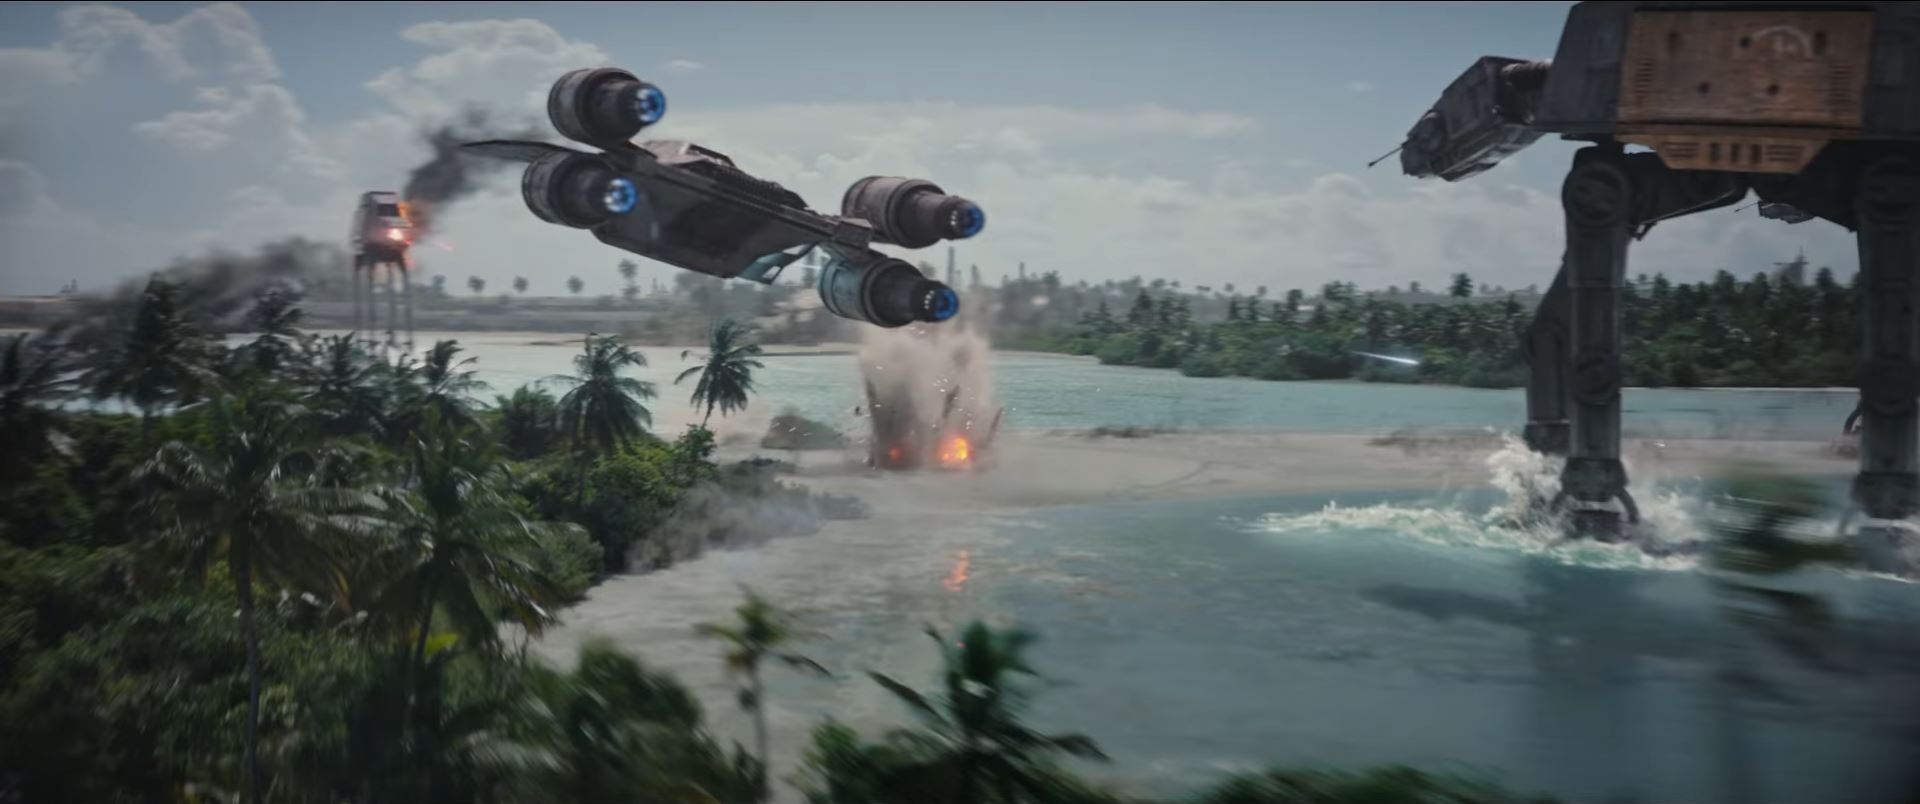 rogue one scarif motivi film guerra star wars